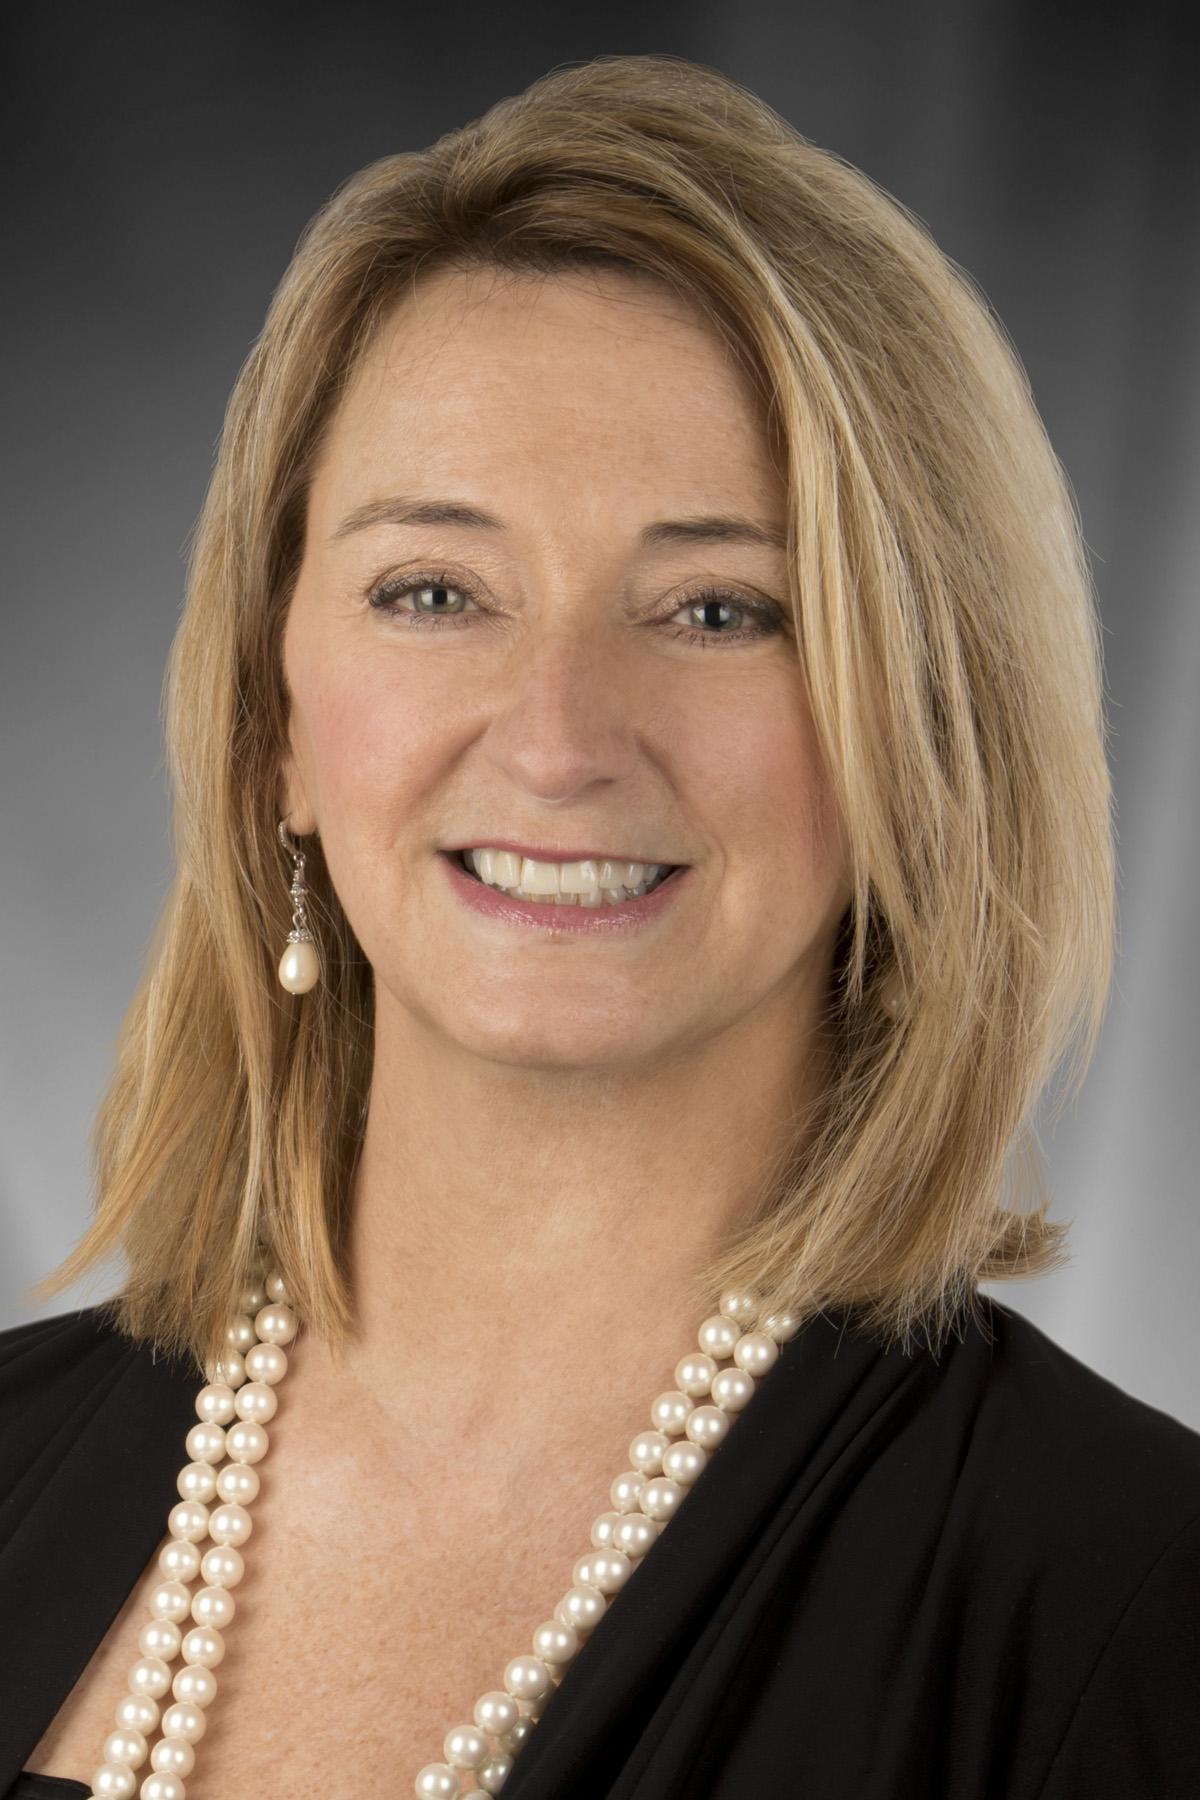 Connie McNamara